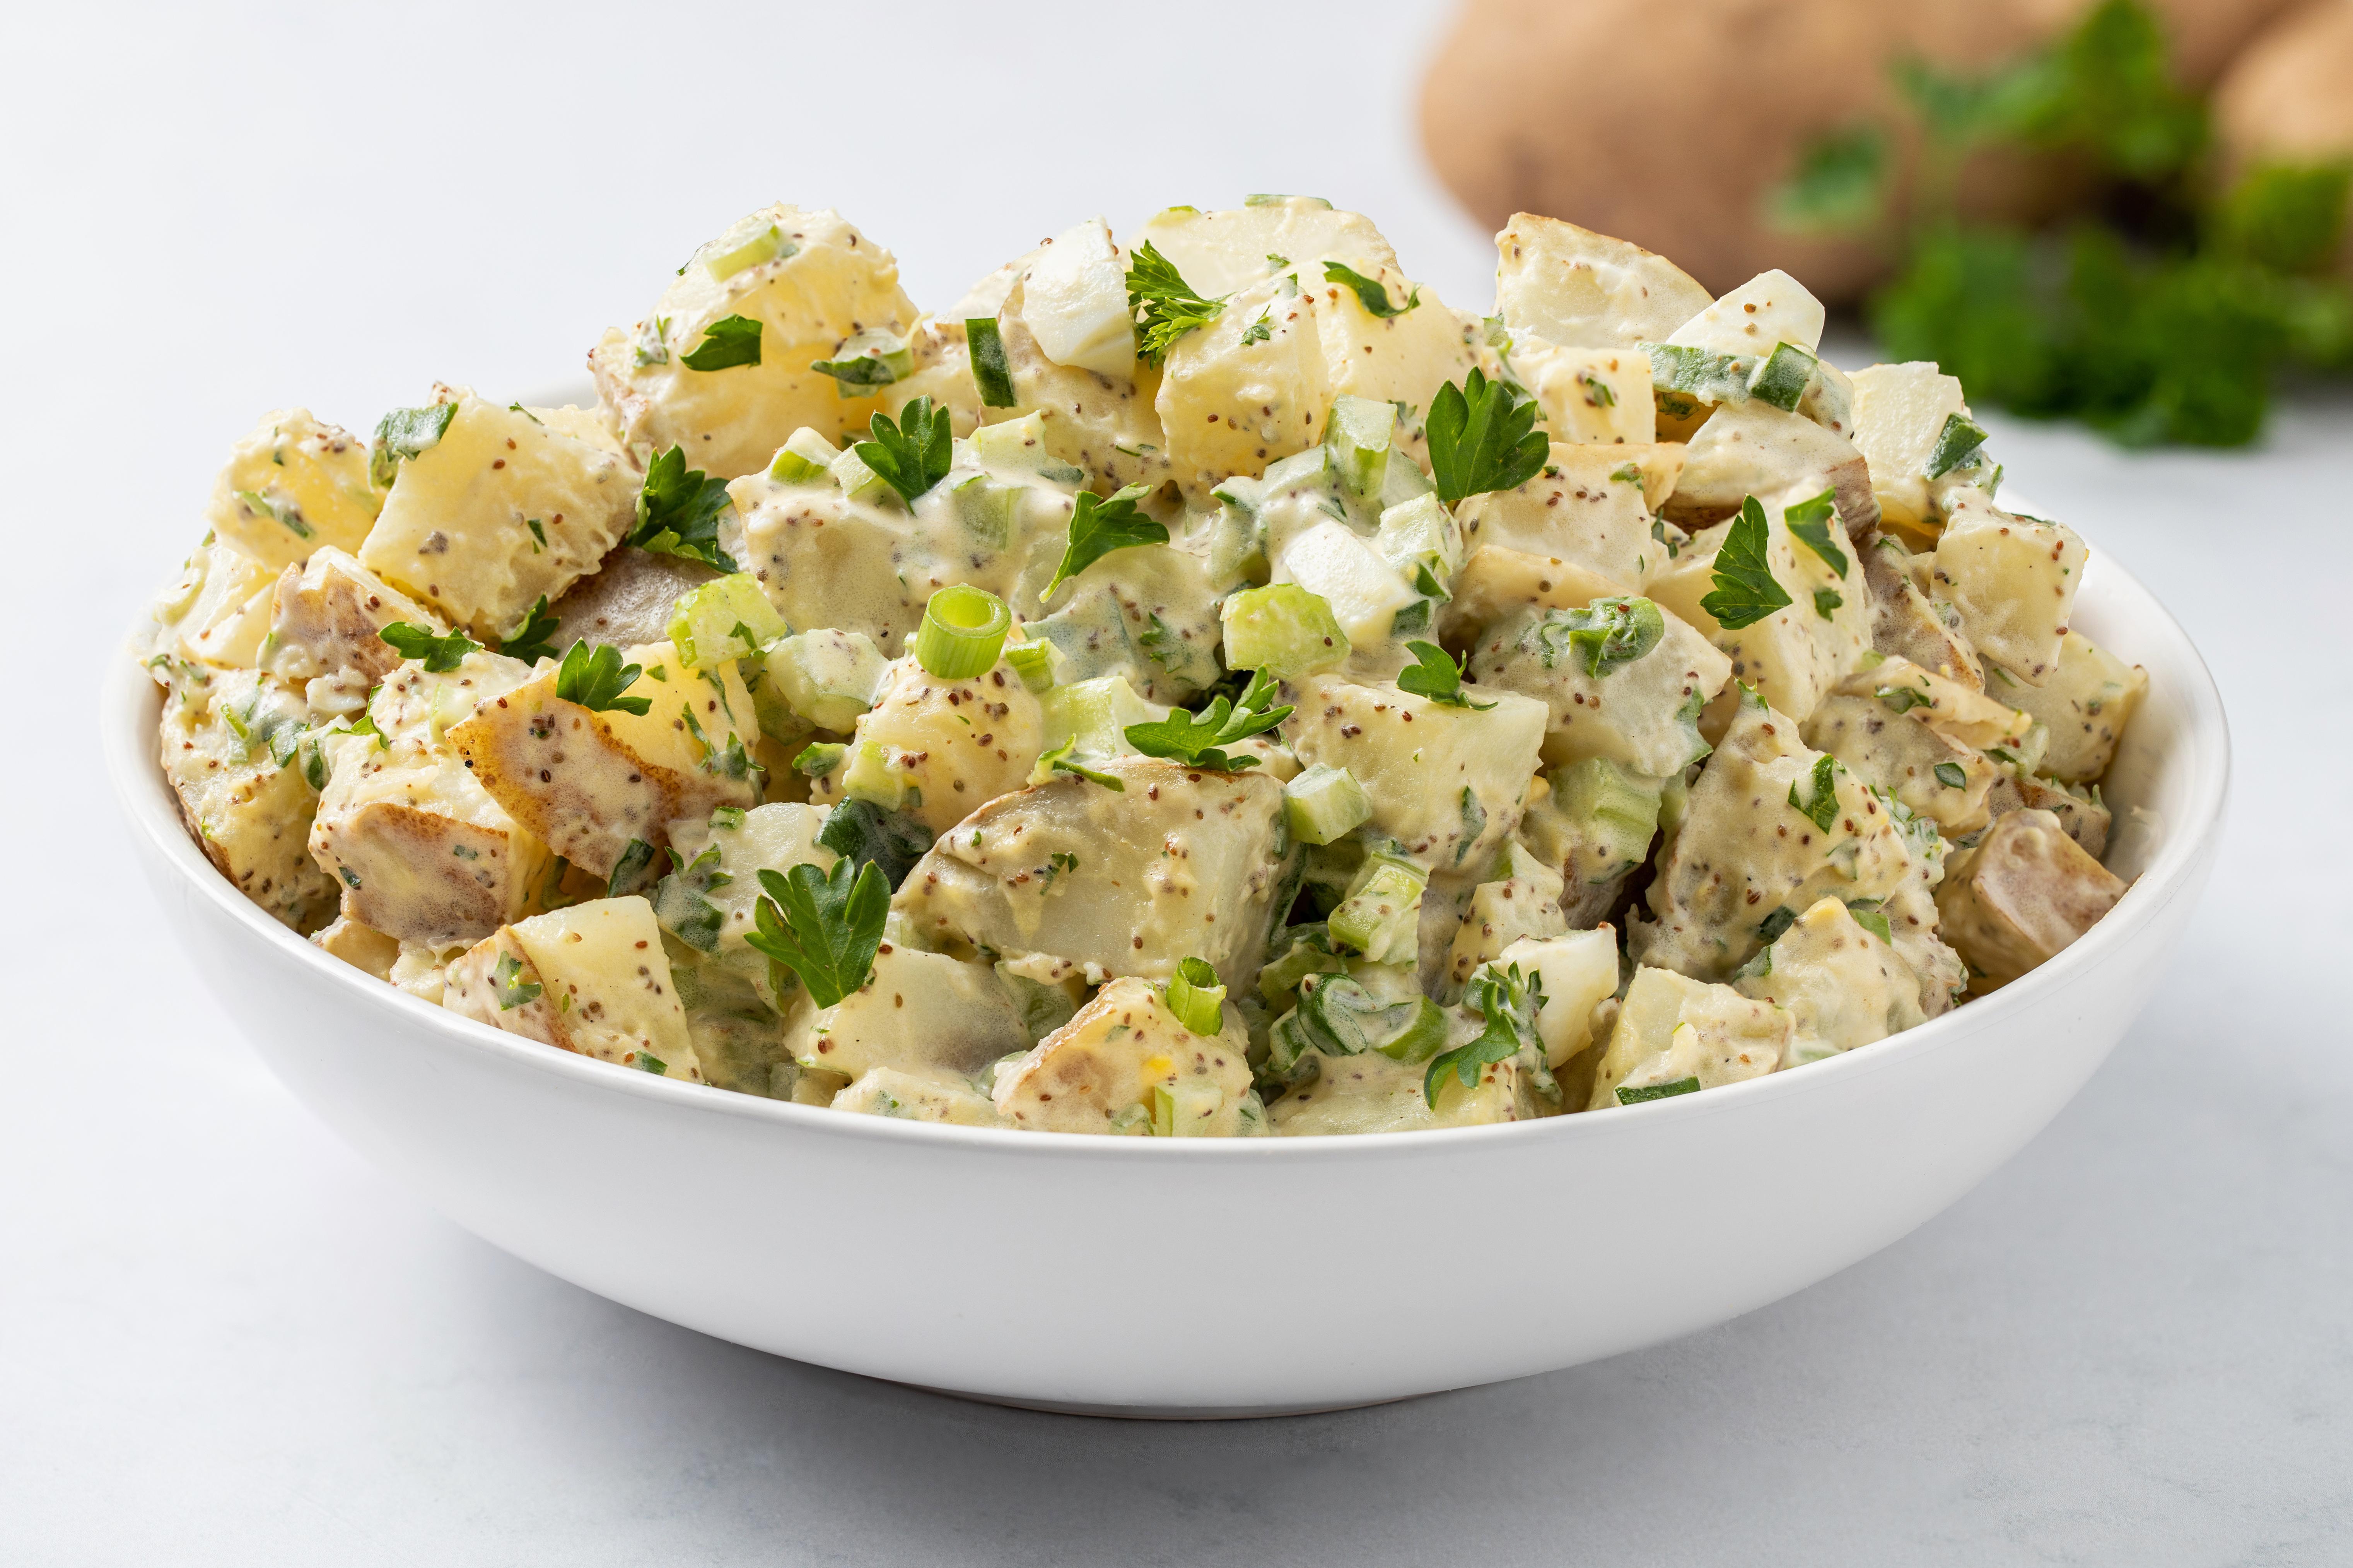 Traditional Potato Salad Recipe With Egg